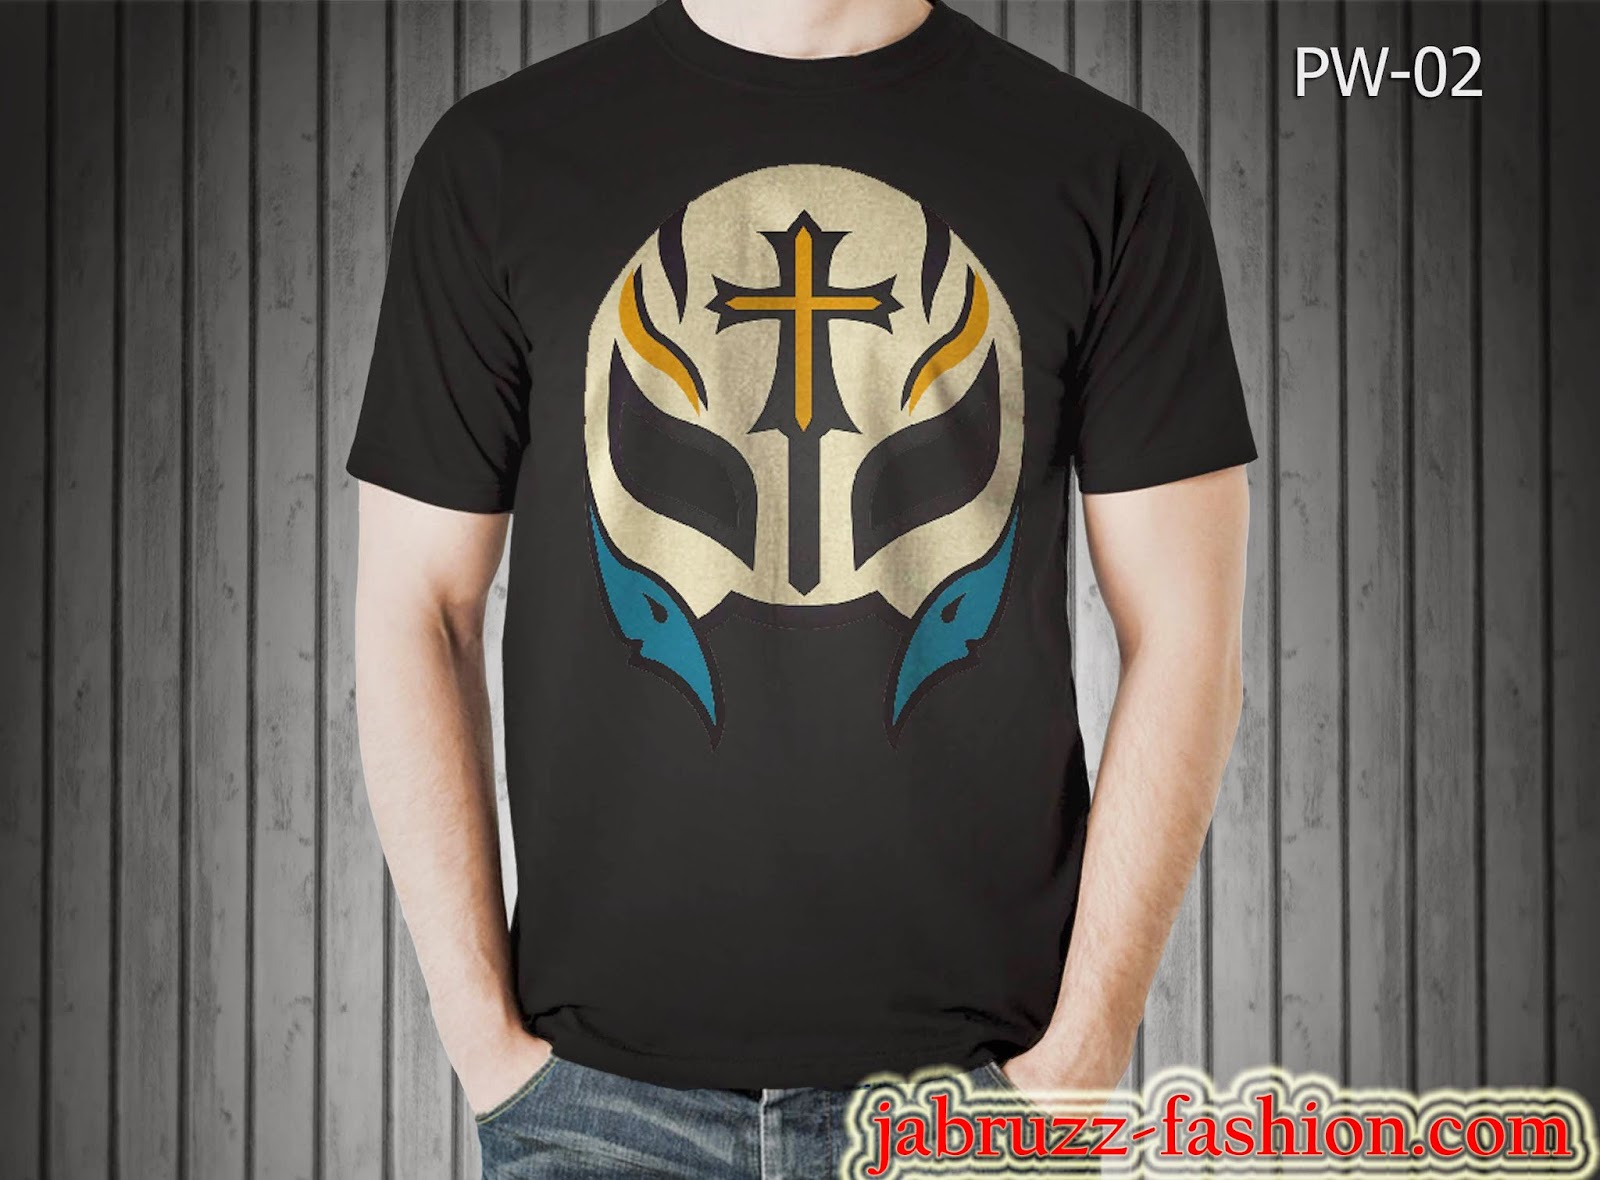 Kaos/T-shirt WWE Topeng Rey Mysterio